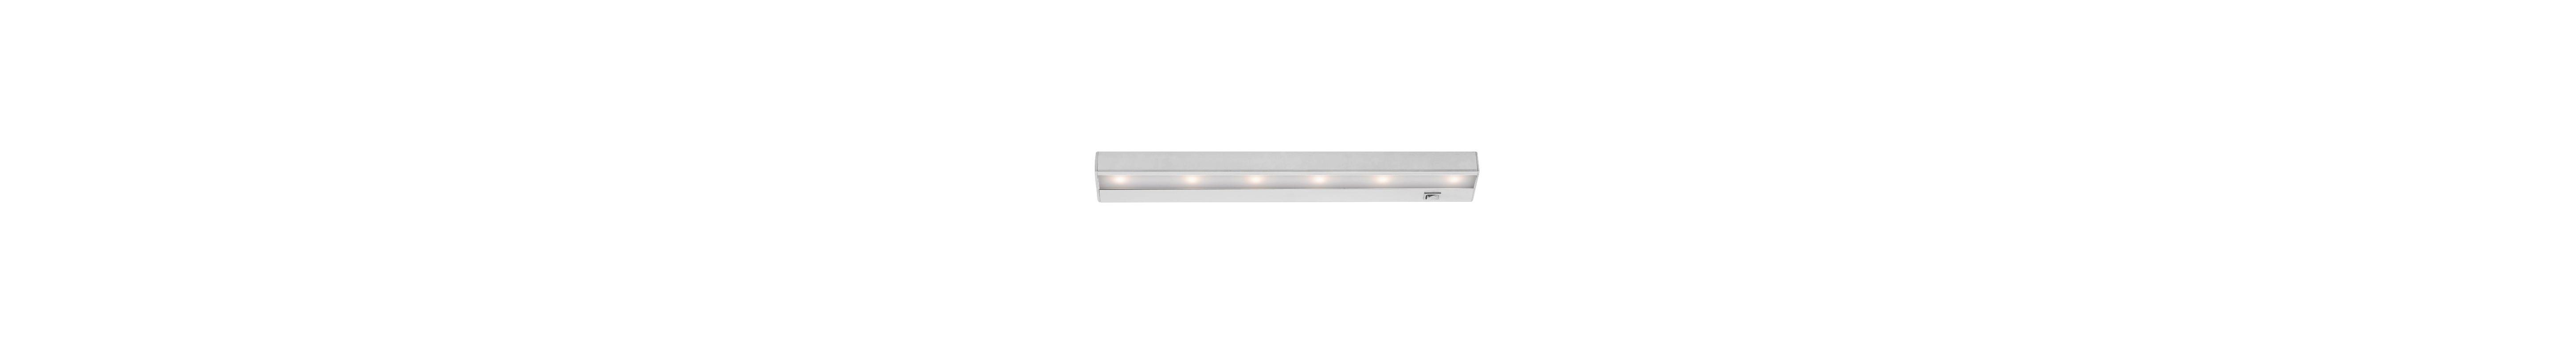 "WAC Lighting BA-LED6-27 18"" Length 2700K High Output LED Under Cabinet"